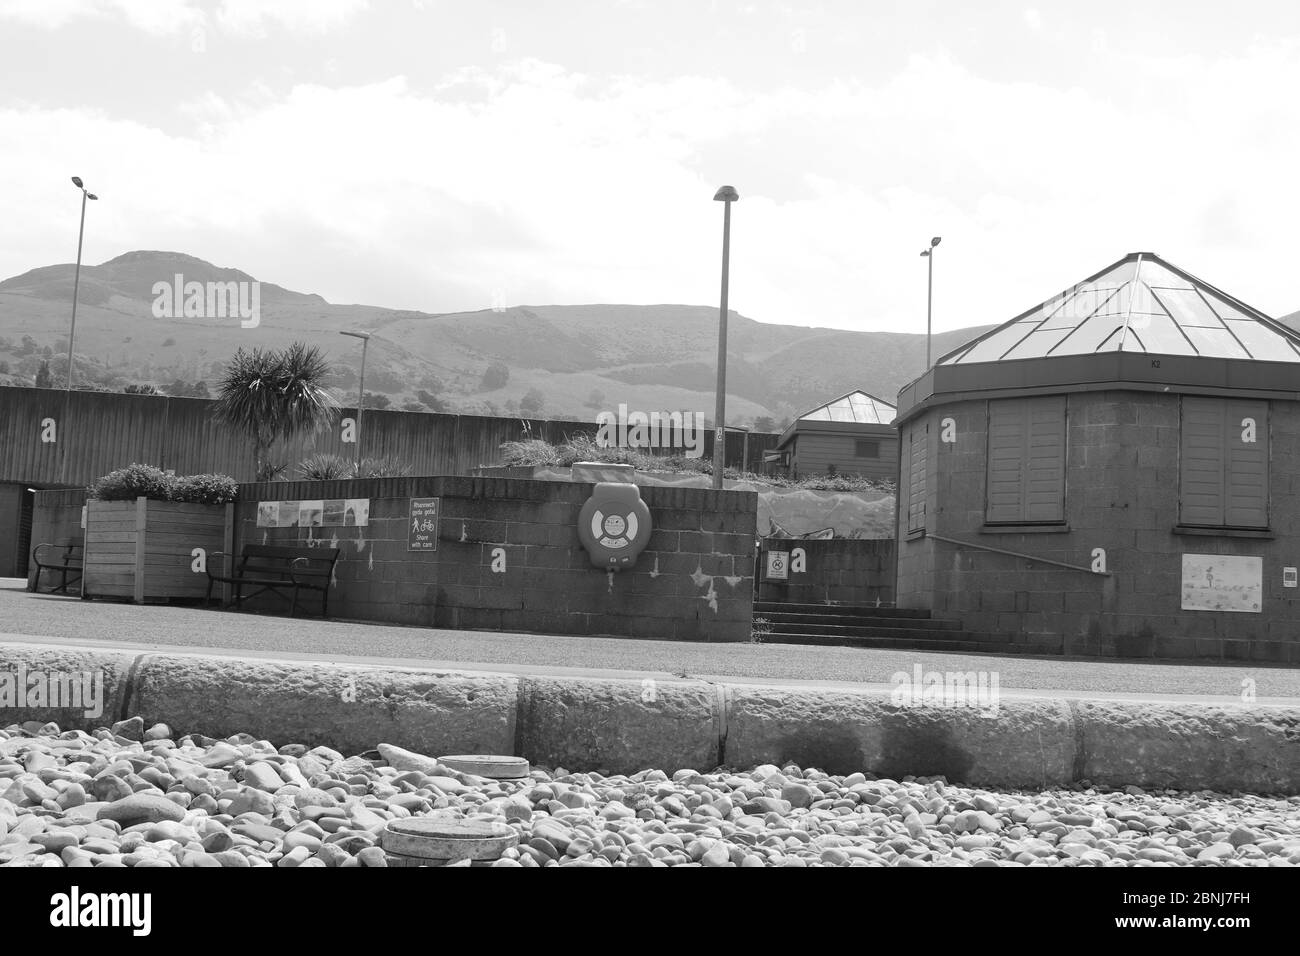 Penmaenmawr, Promenade North Wales Credit : Mike Clarke / Alamy Stock Photos Stockfoto